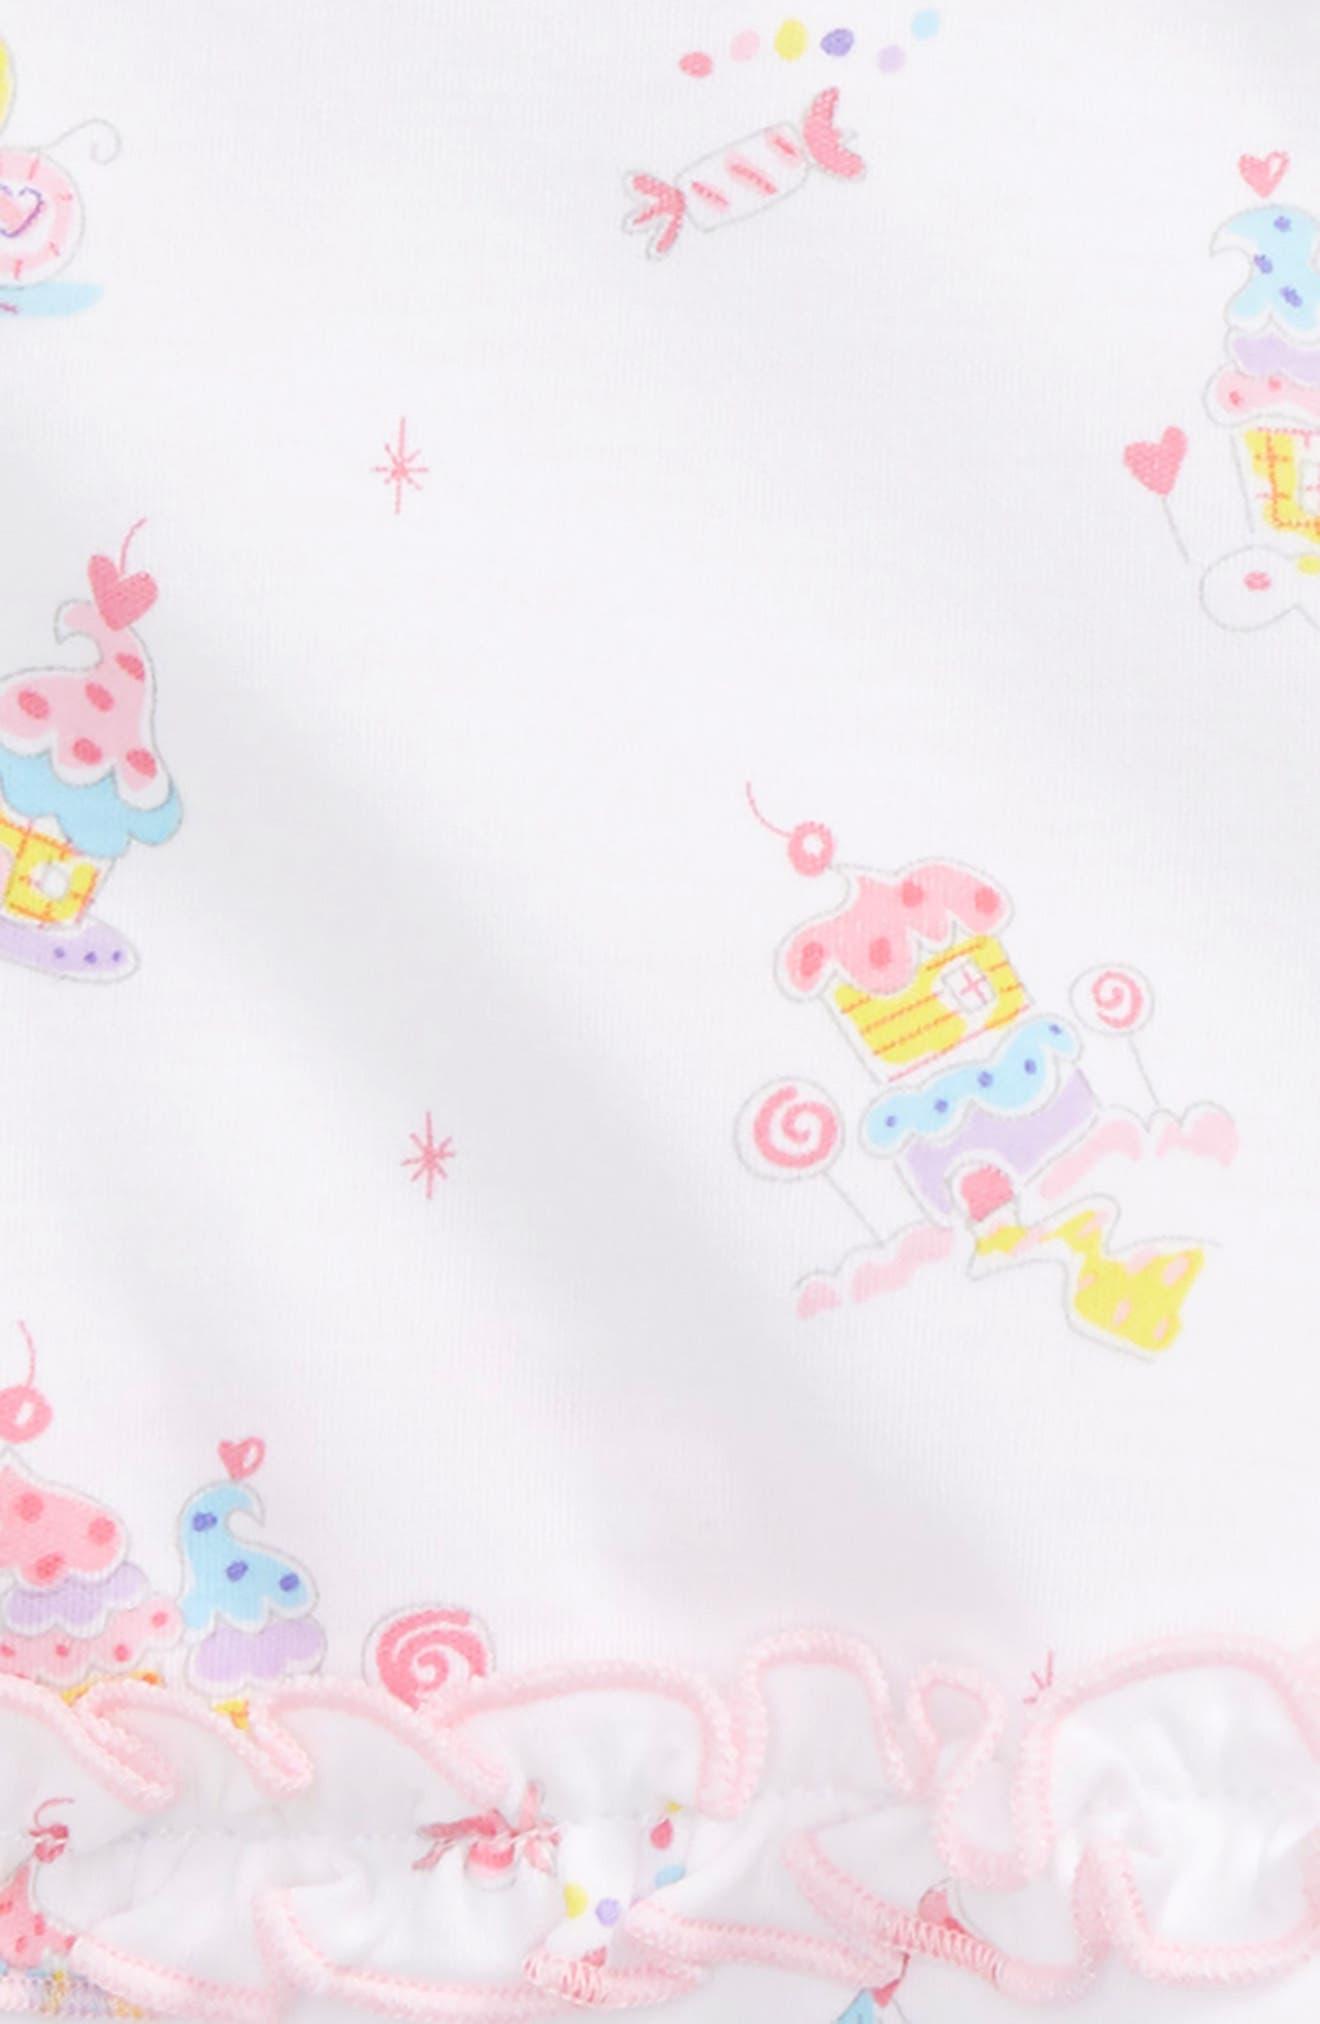 Candy Castles Top & Shorts Set,                             Alternate thumbnail 2, color,                             Candy Castles